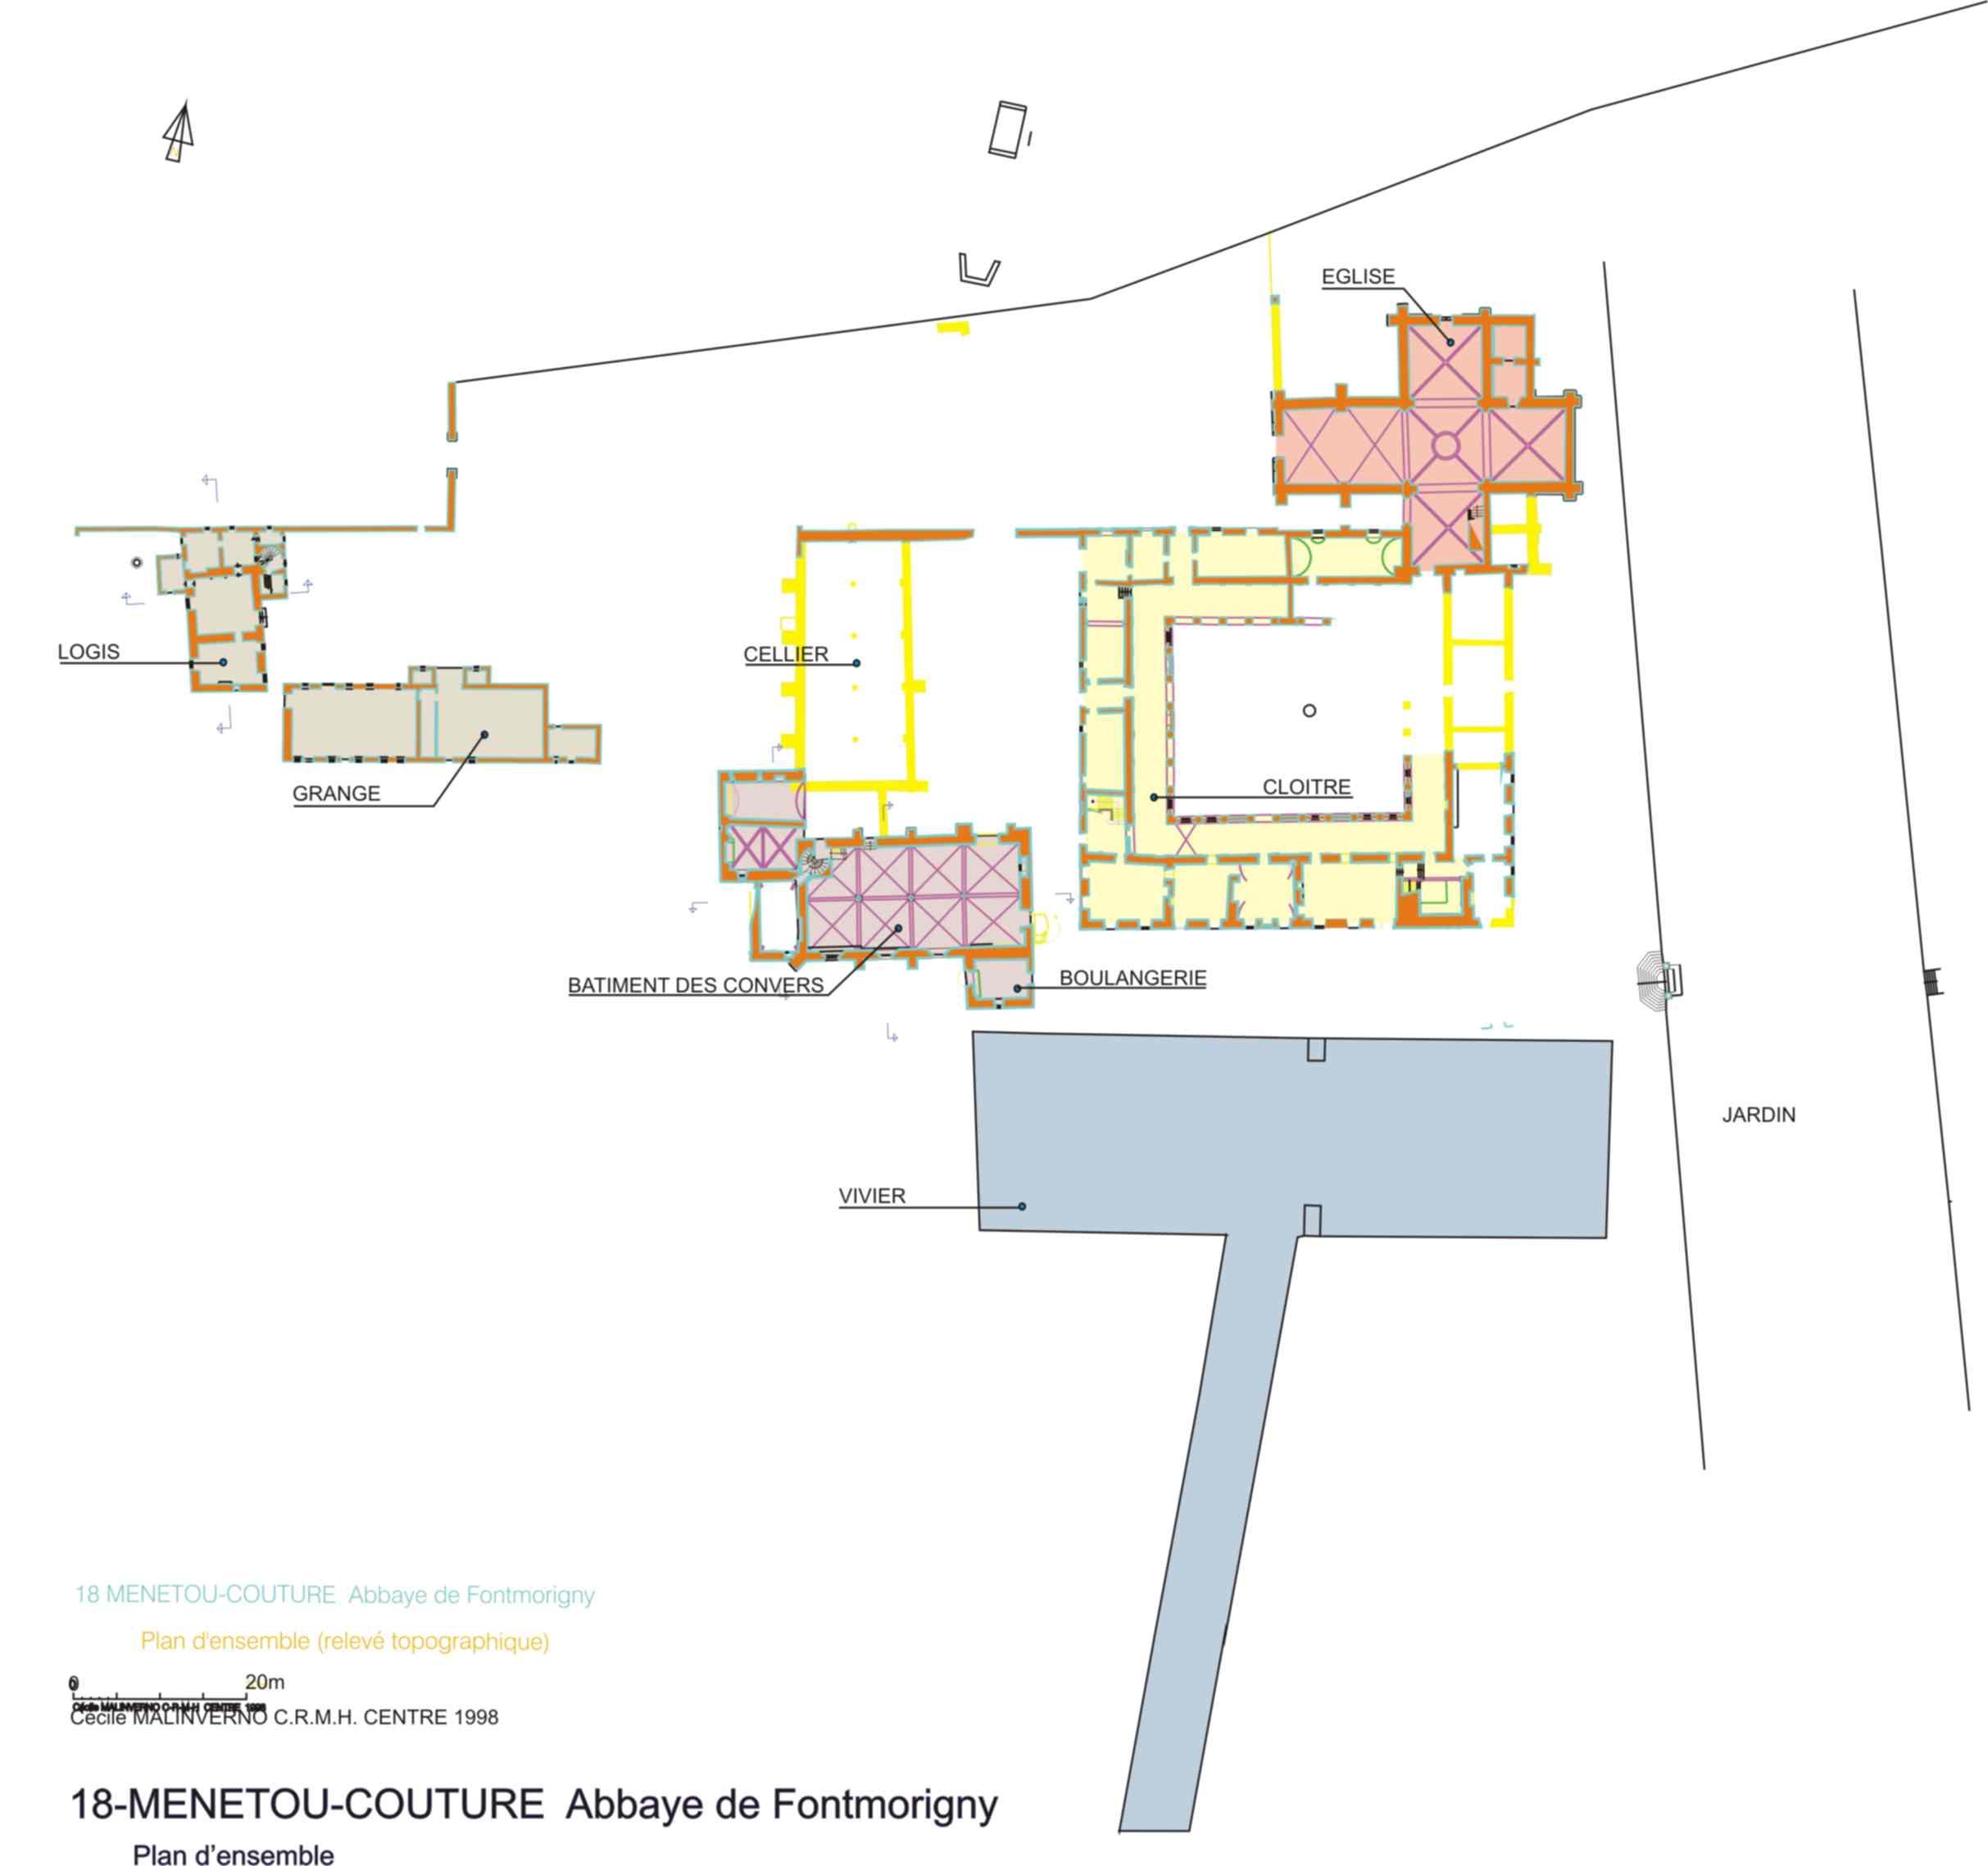 Abbaye cistercienne de Fontmorigny